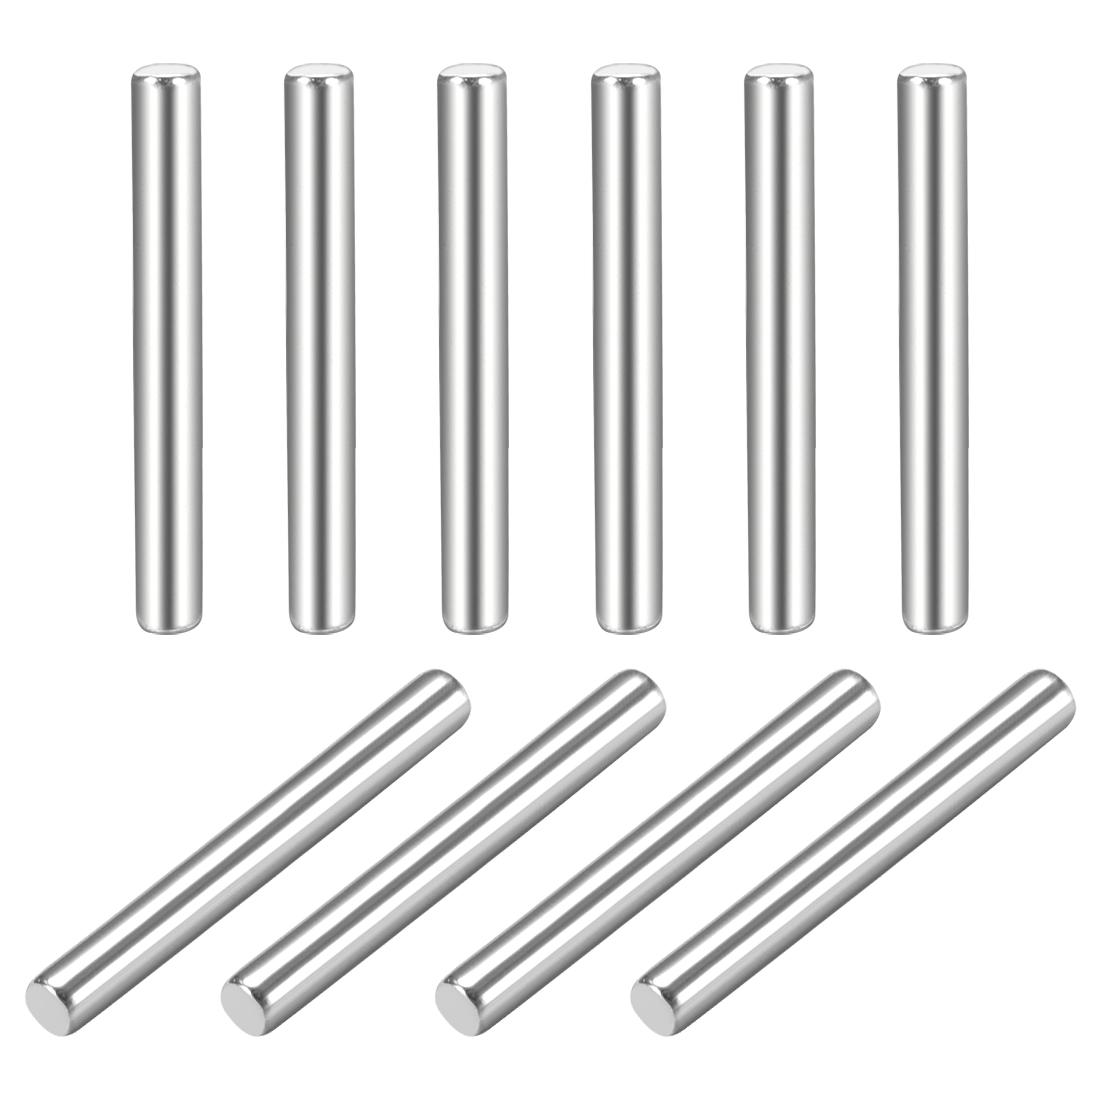 10Pcs 1.5mm x 16mm Dowel Pin 304 Stainless Steel Shelf Support Pin Fasten